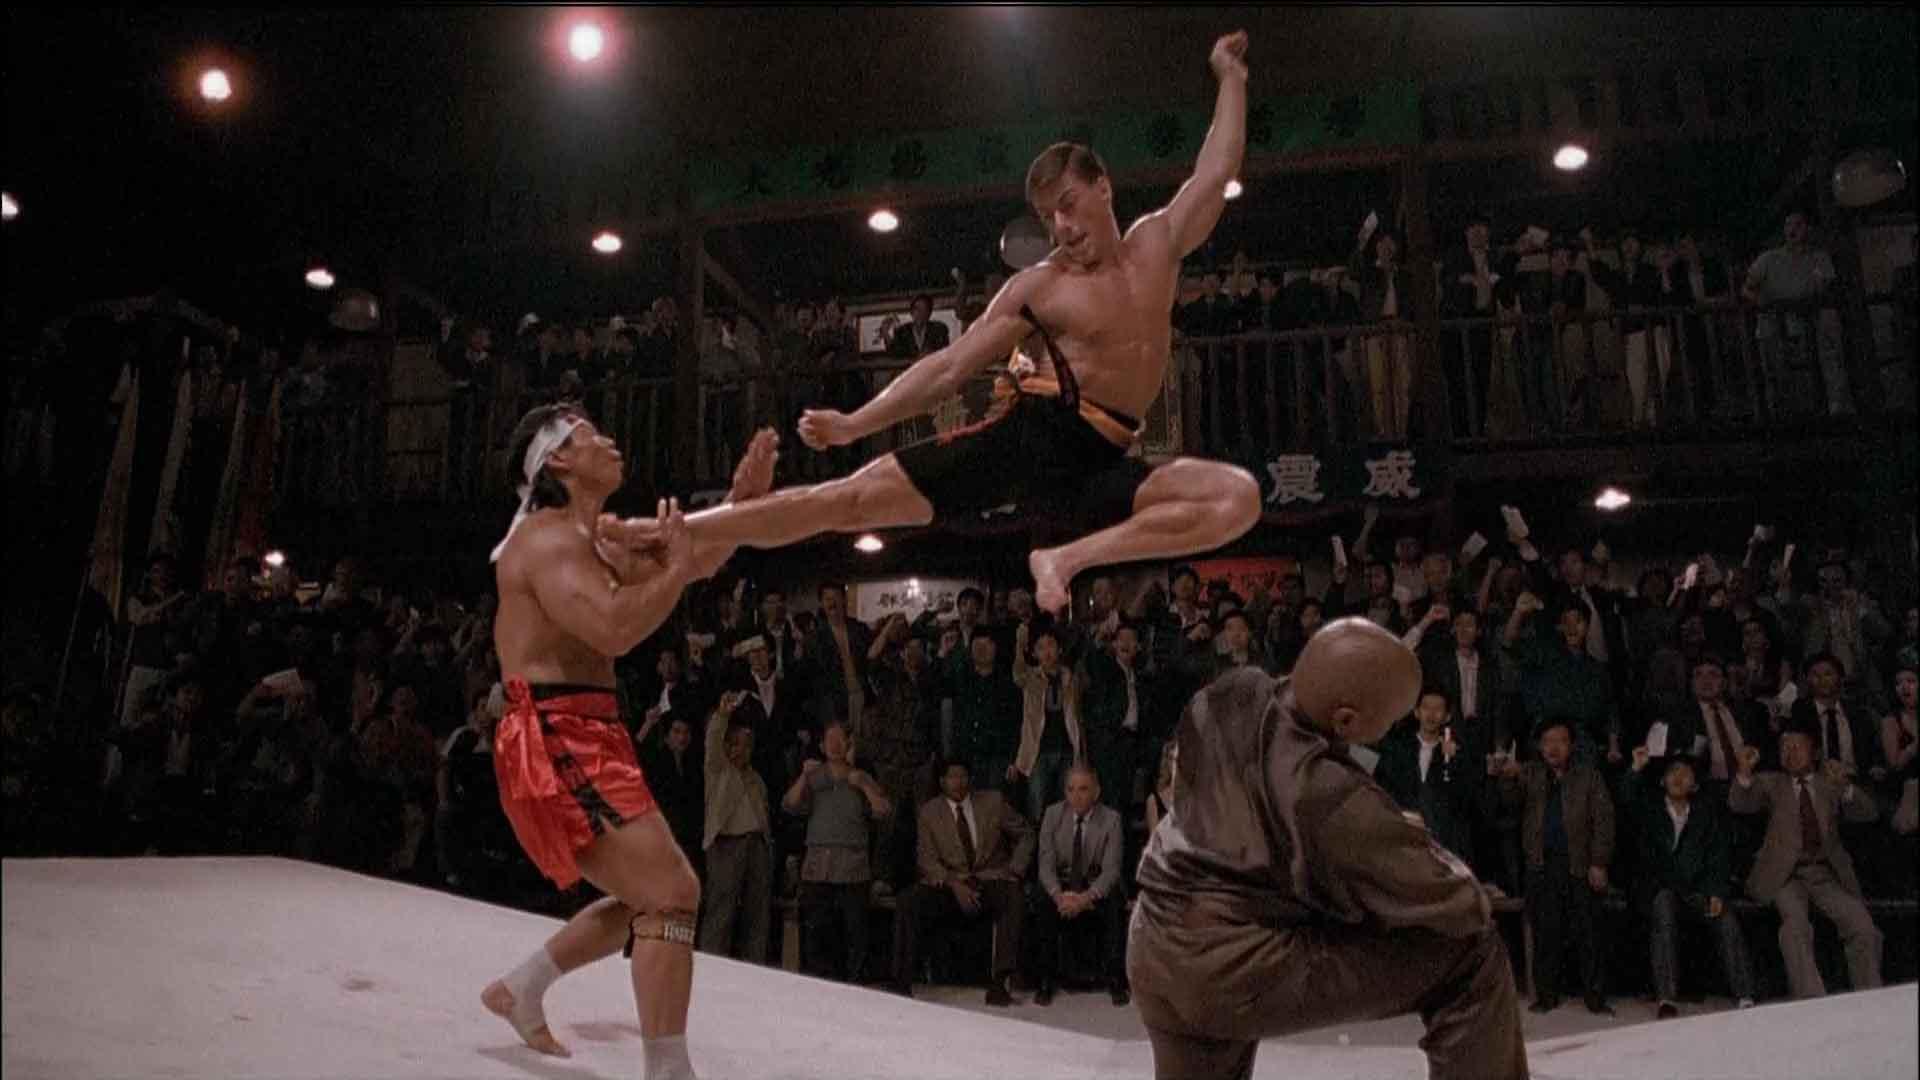 Bloodsport Jean-Claude Van Damme movie